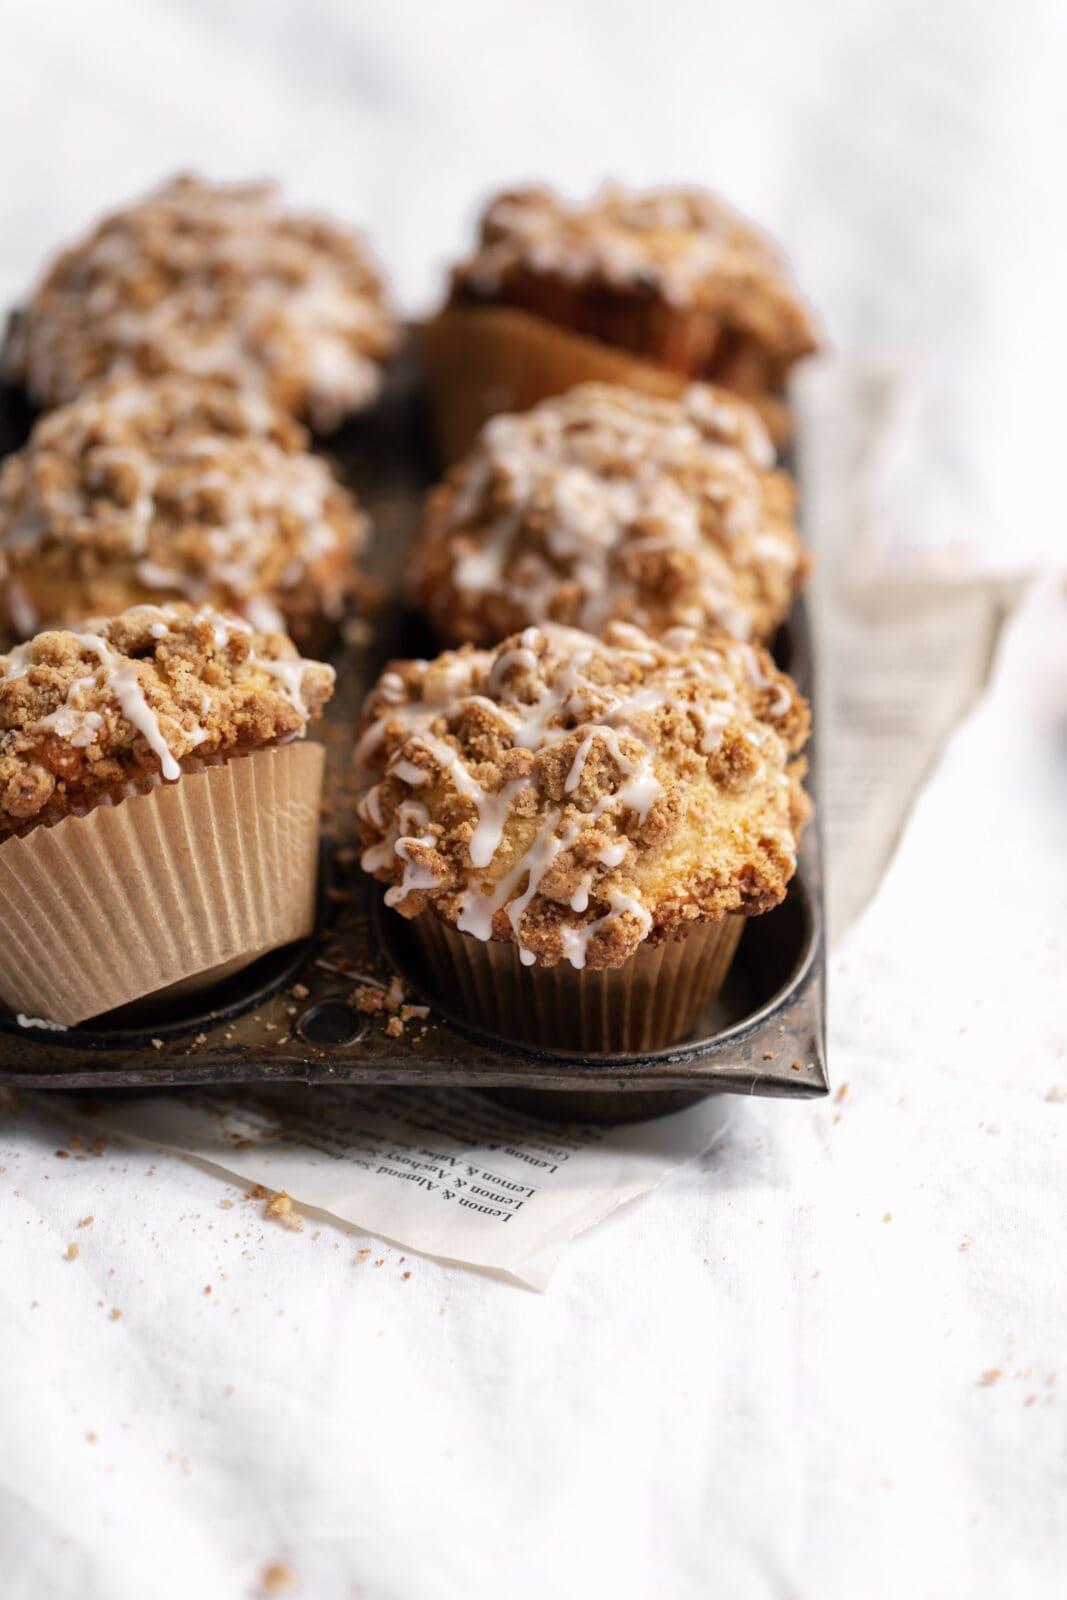 coffee cake muffins with cinnamon streusel